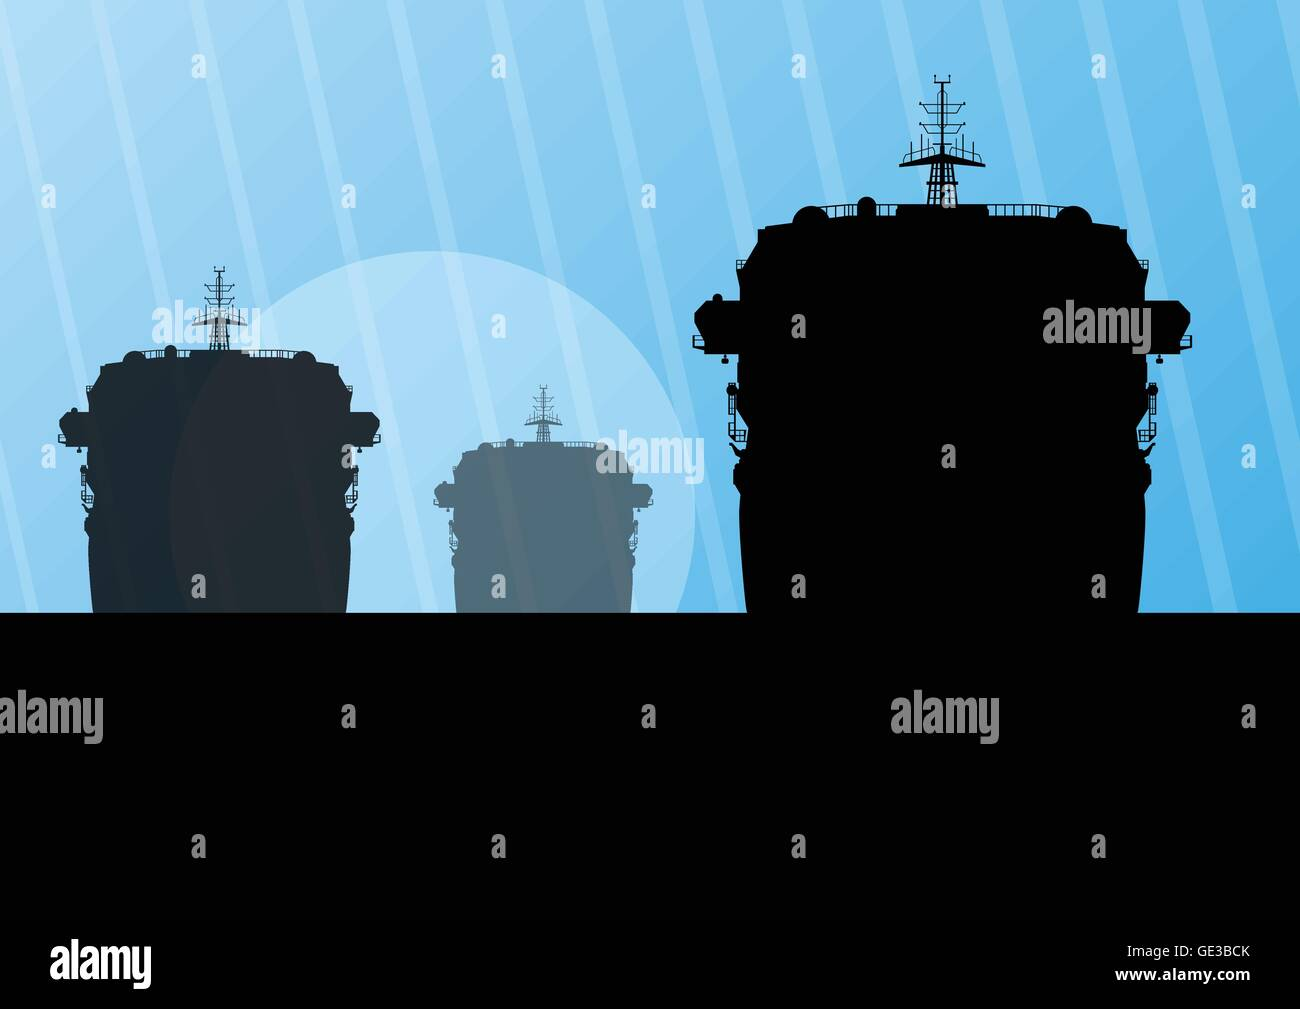 Navy military battleships with guns in ocean landscape background illustration vector - Stock Vector